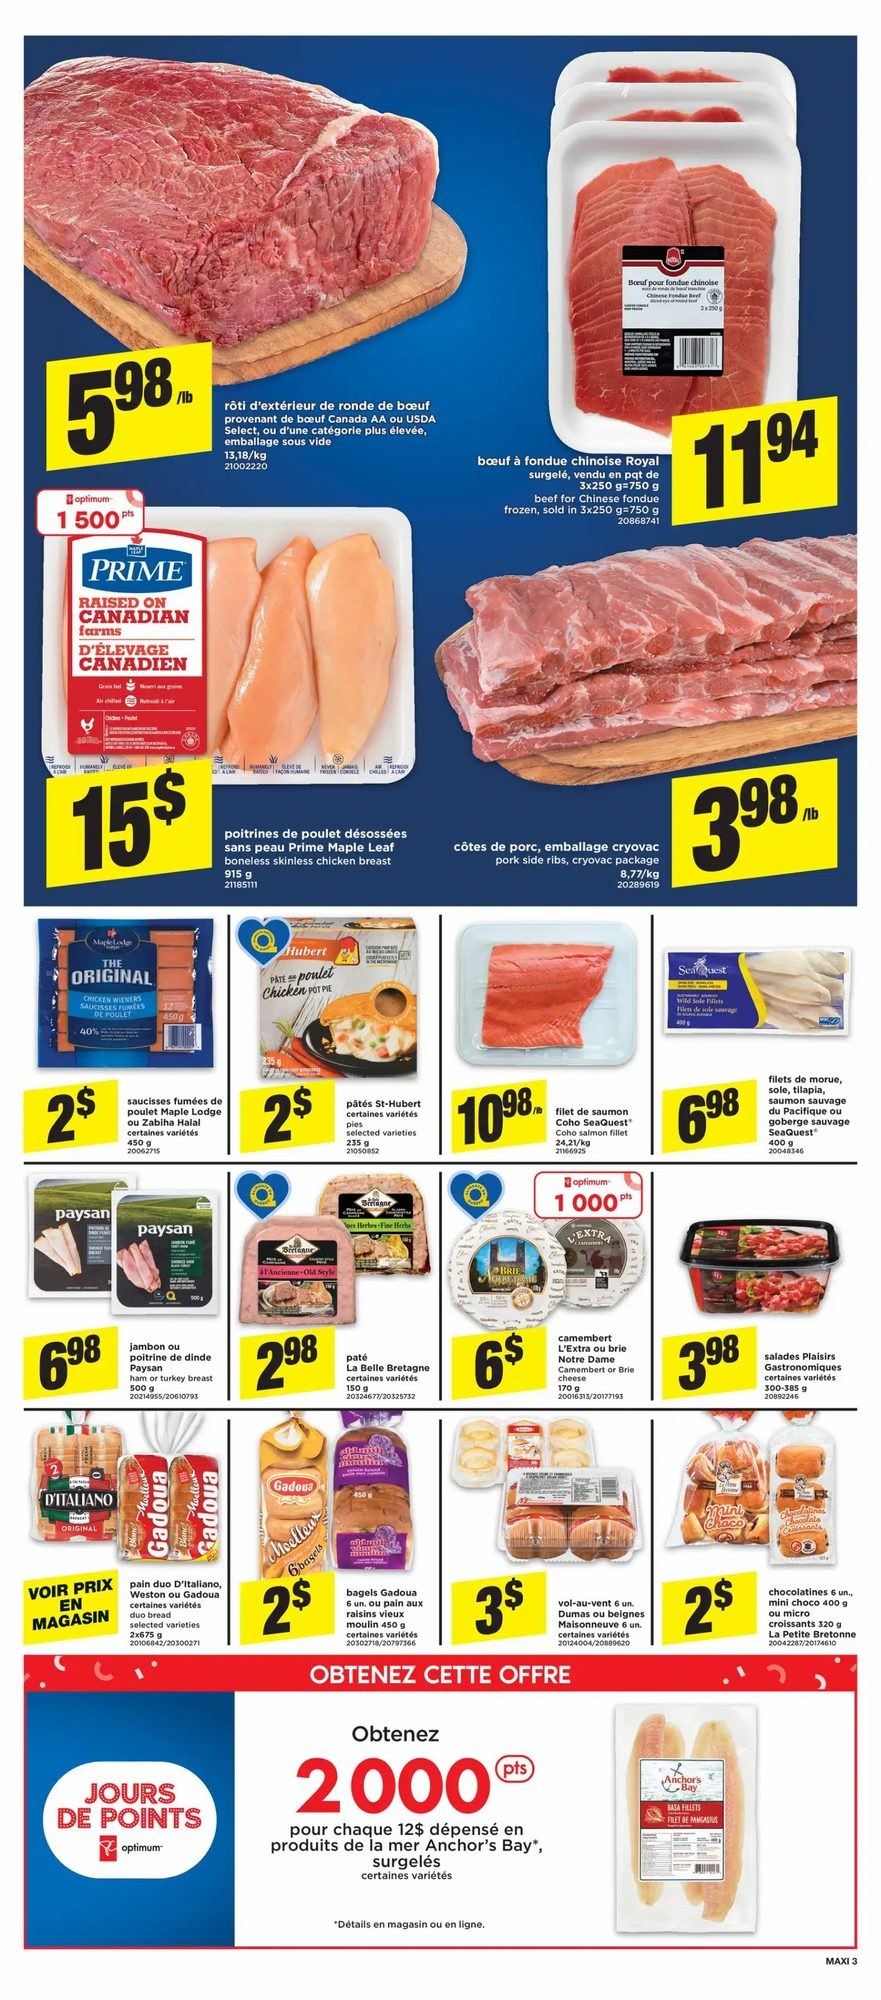 Maxi - Weekly Flyer Specials - Page 5